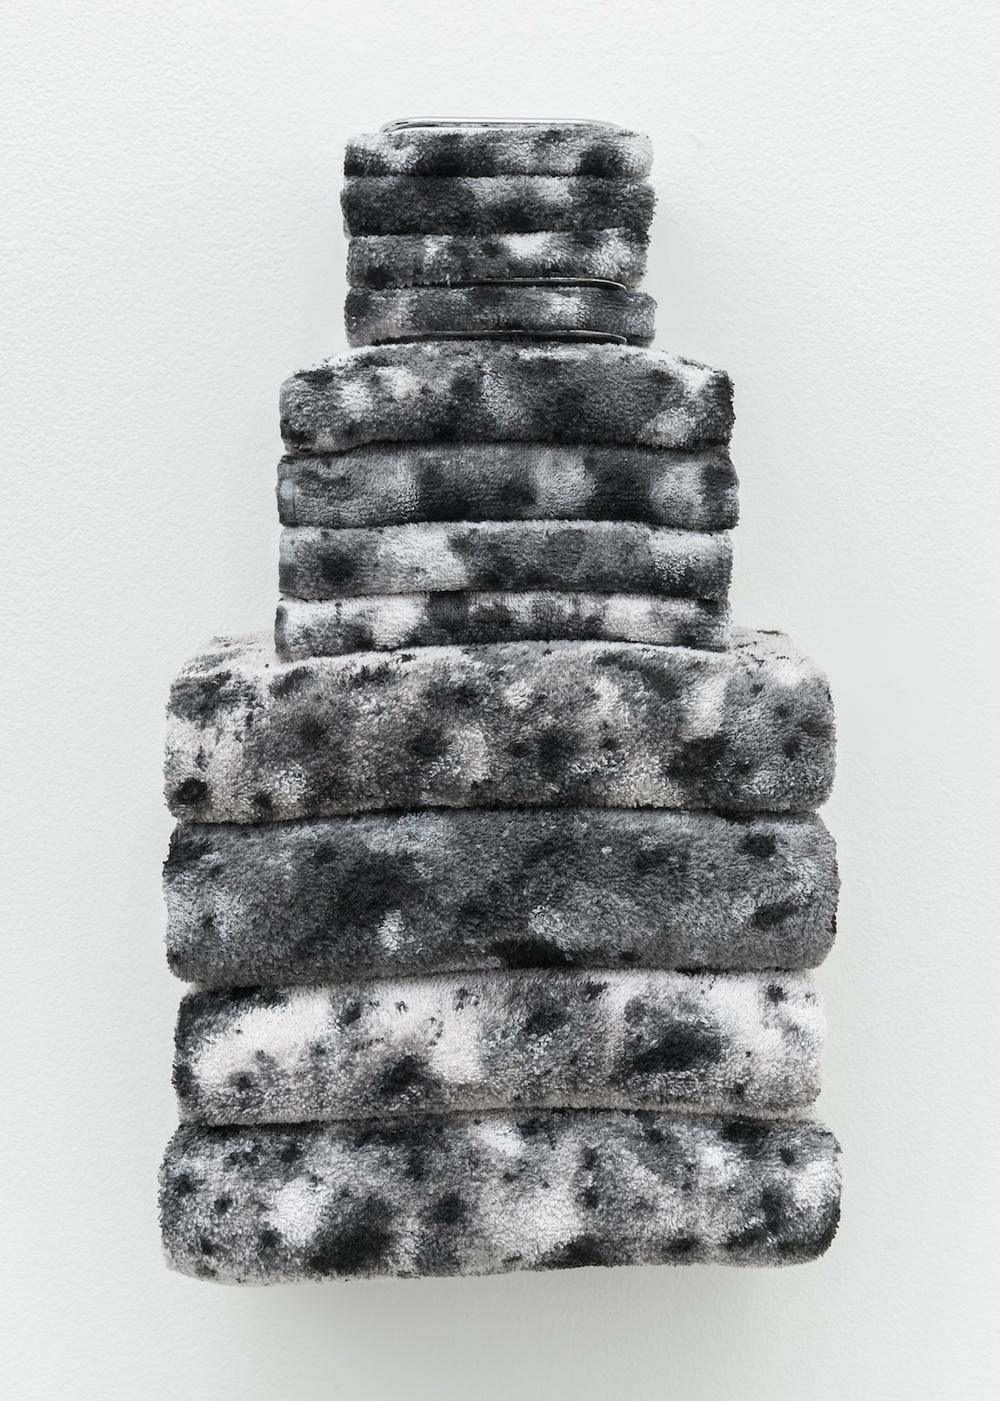 Amanda Ross-Ho  Untitled Textile Arrangement (TOWEL RACK #3)  2014 Chrome towel rack, acrylic and dye on washcloths, hand towels and bath towels 21h x 11 ½w x 7d in ARH104